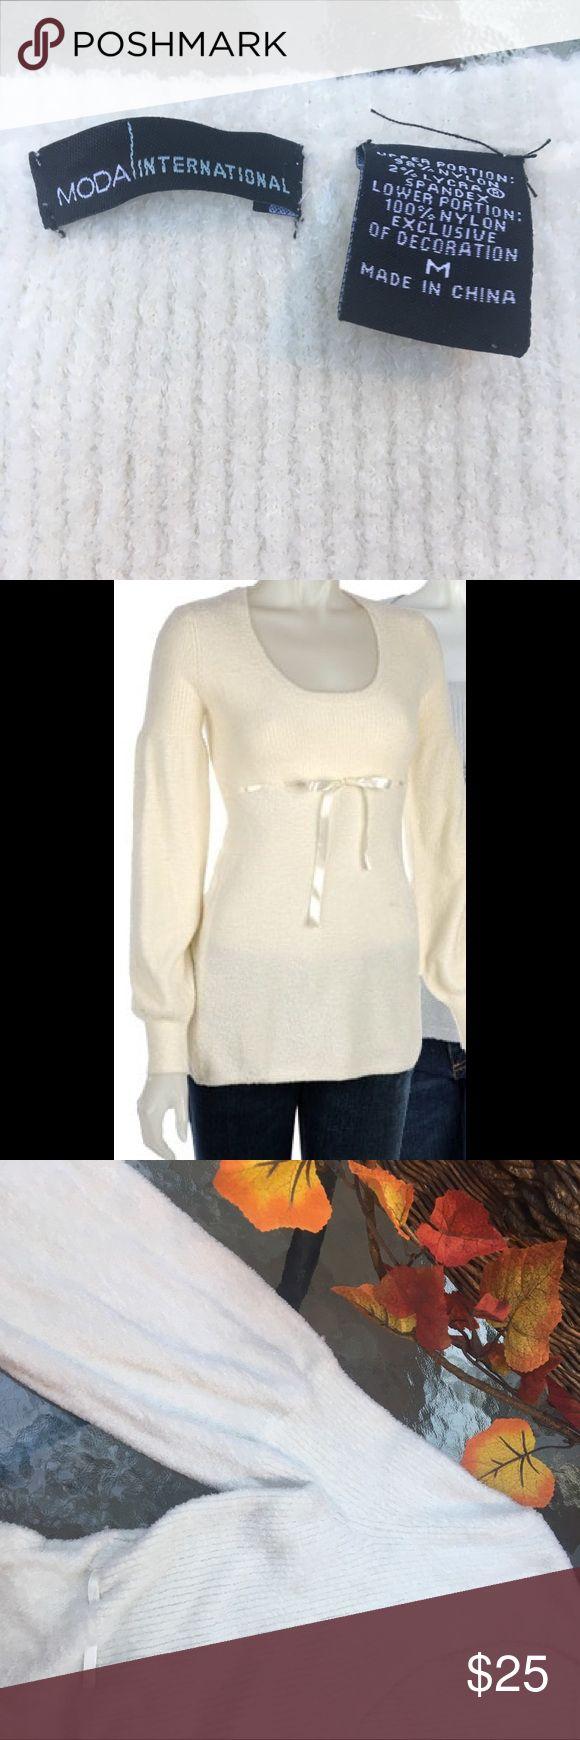 🌍 MODA INTERNATIONAL BABY DOLL SWEATER MEDIUM Beautiful Winter White, VERY SOFT Nylon/Lycra, EUC Moda International Sweaters